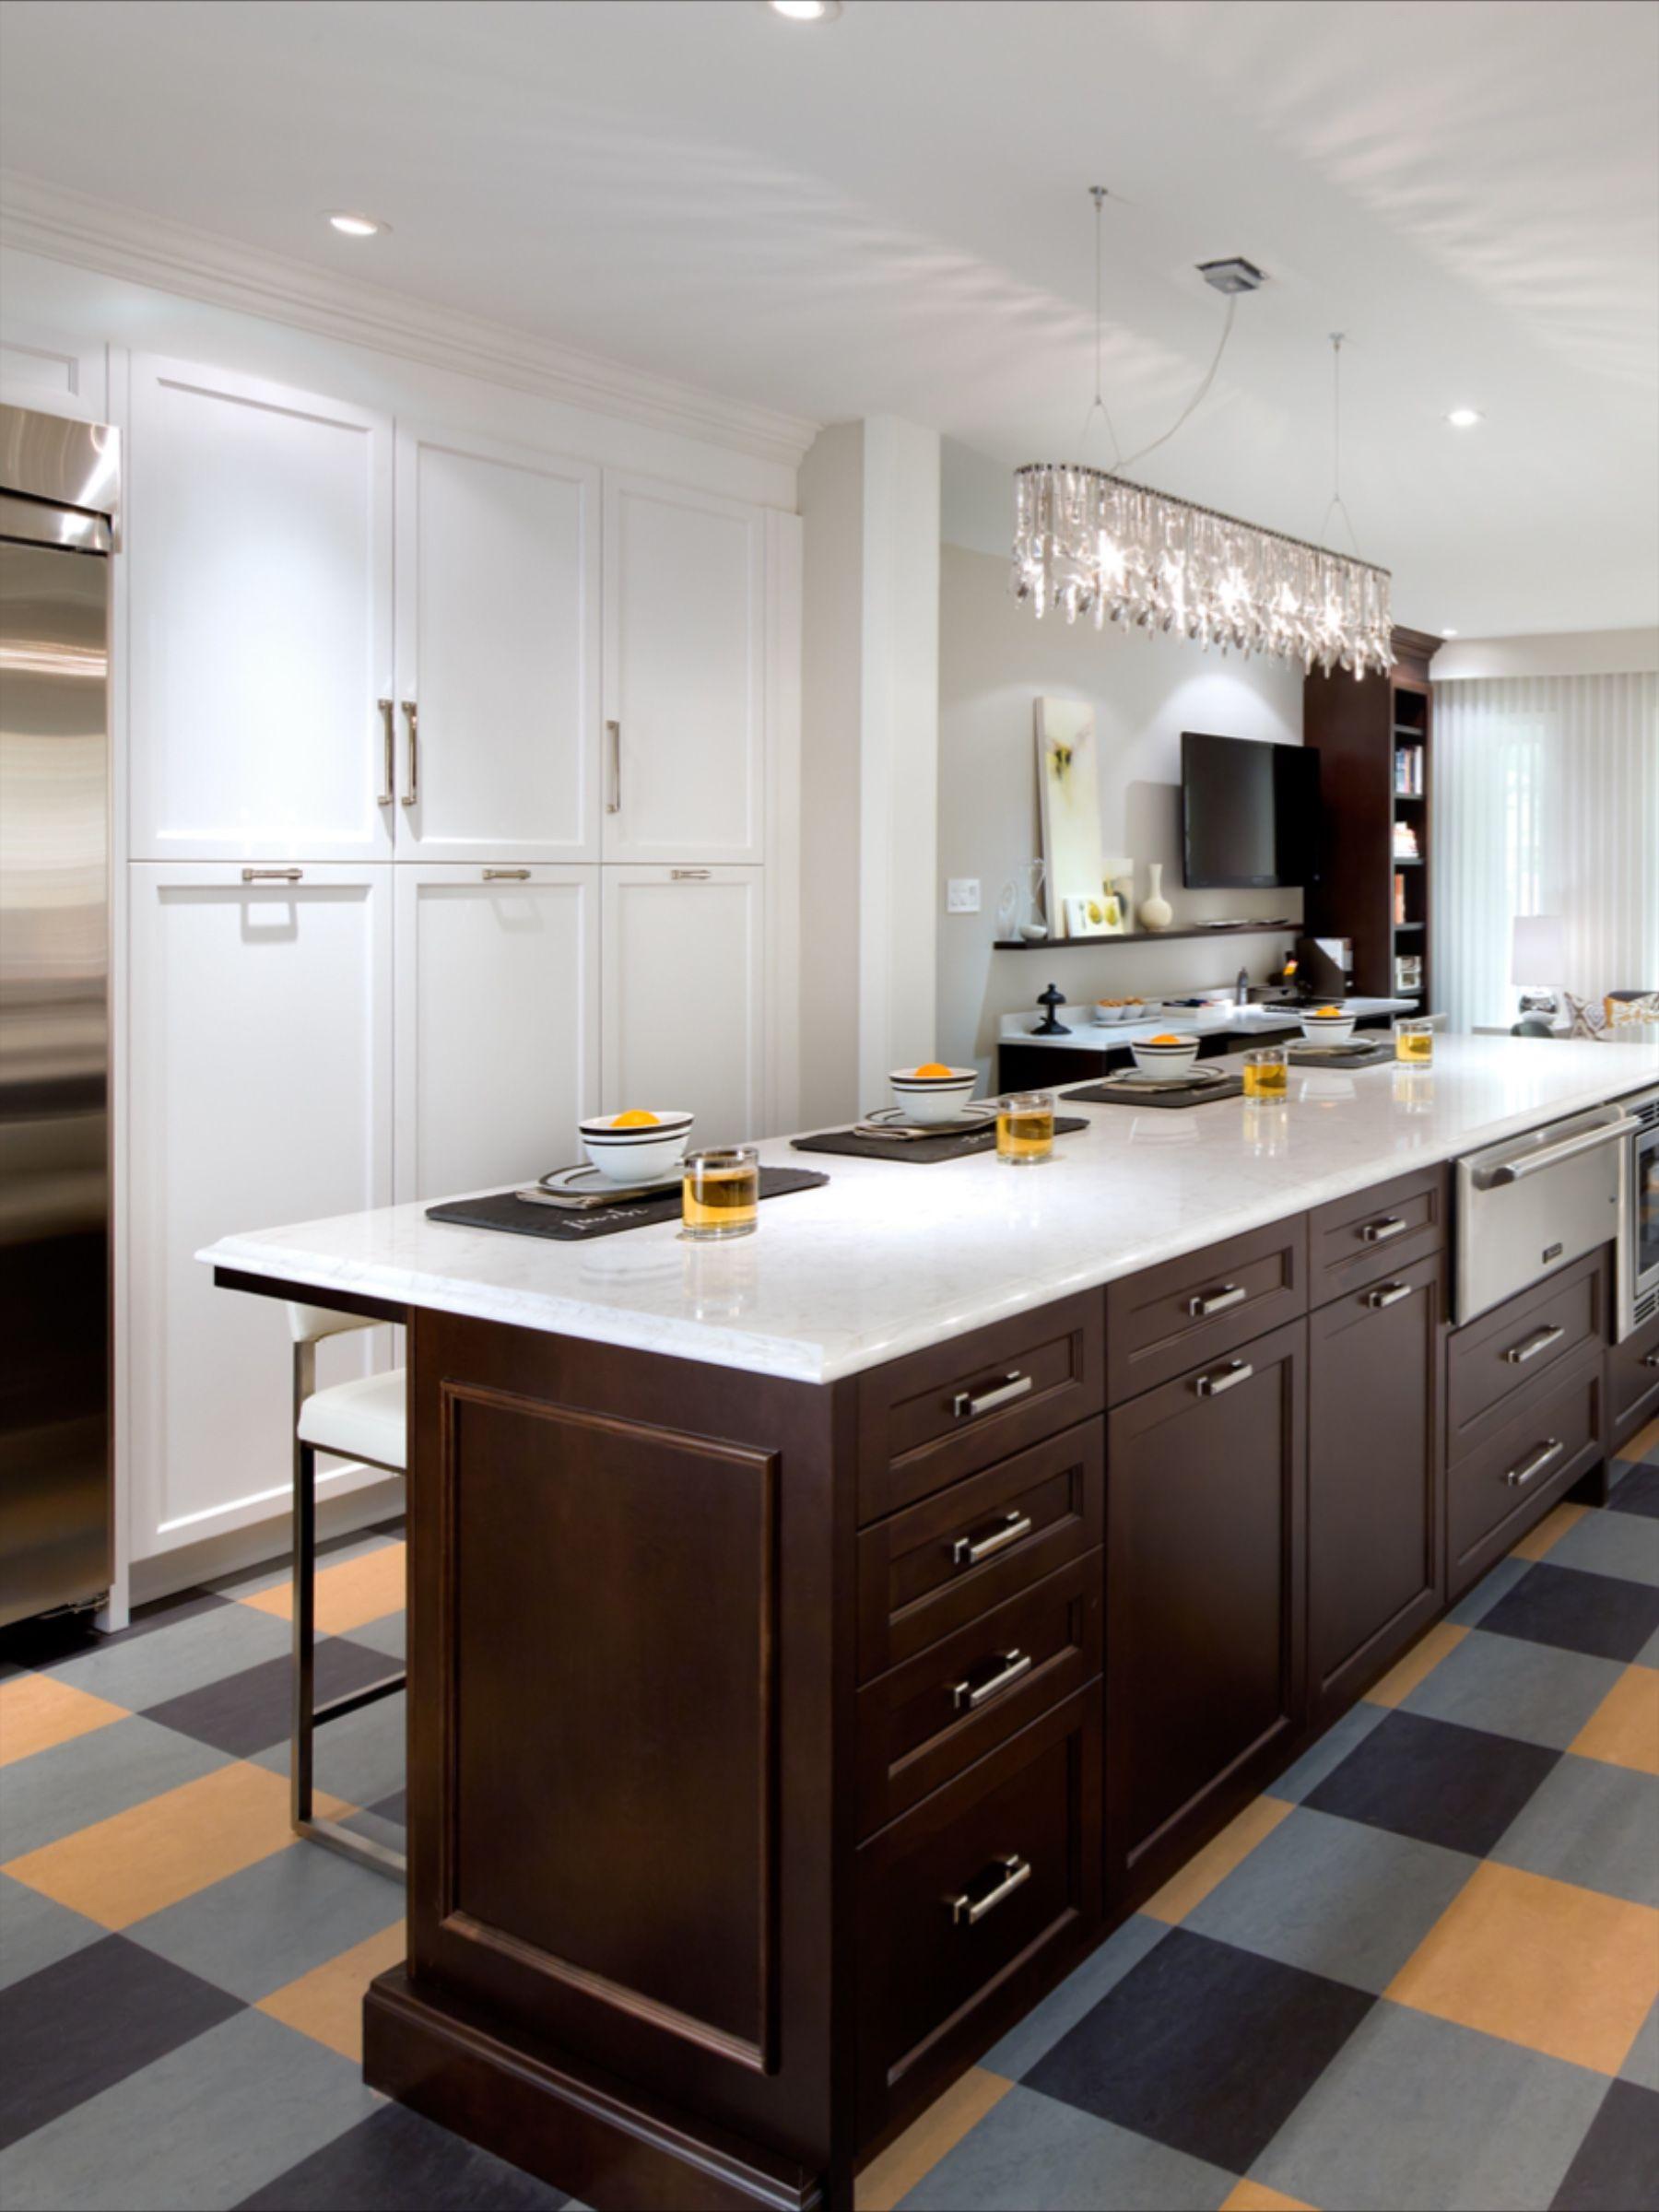 Kitchen Design By Candice Olson Candiceolson Online Kitchen Design Kitchen Designs Layout Kitchen Design Small